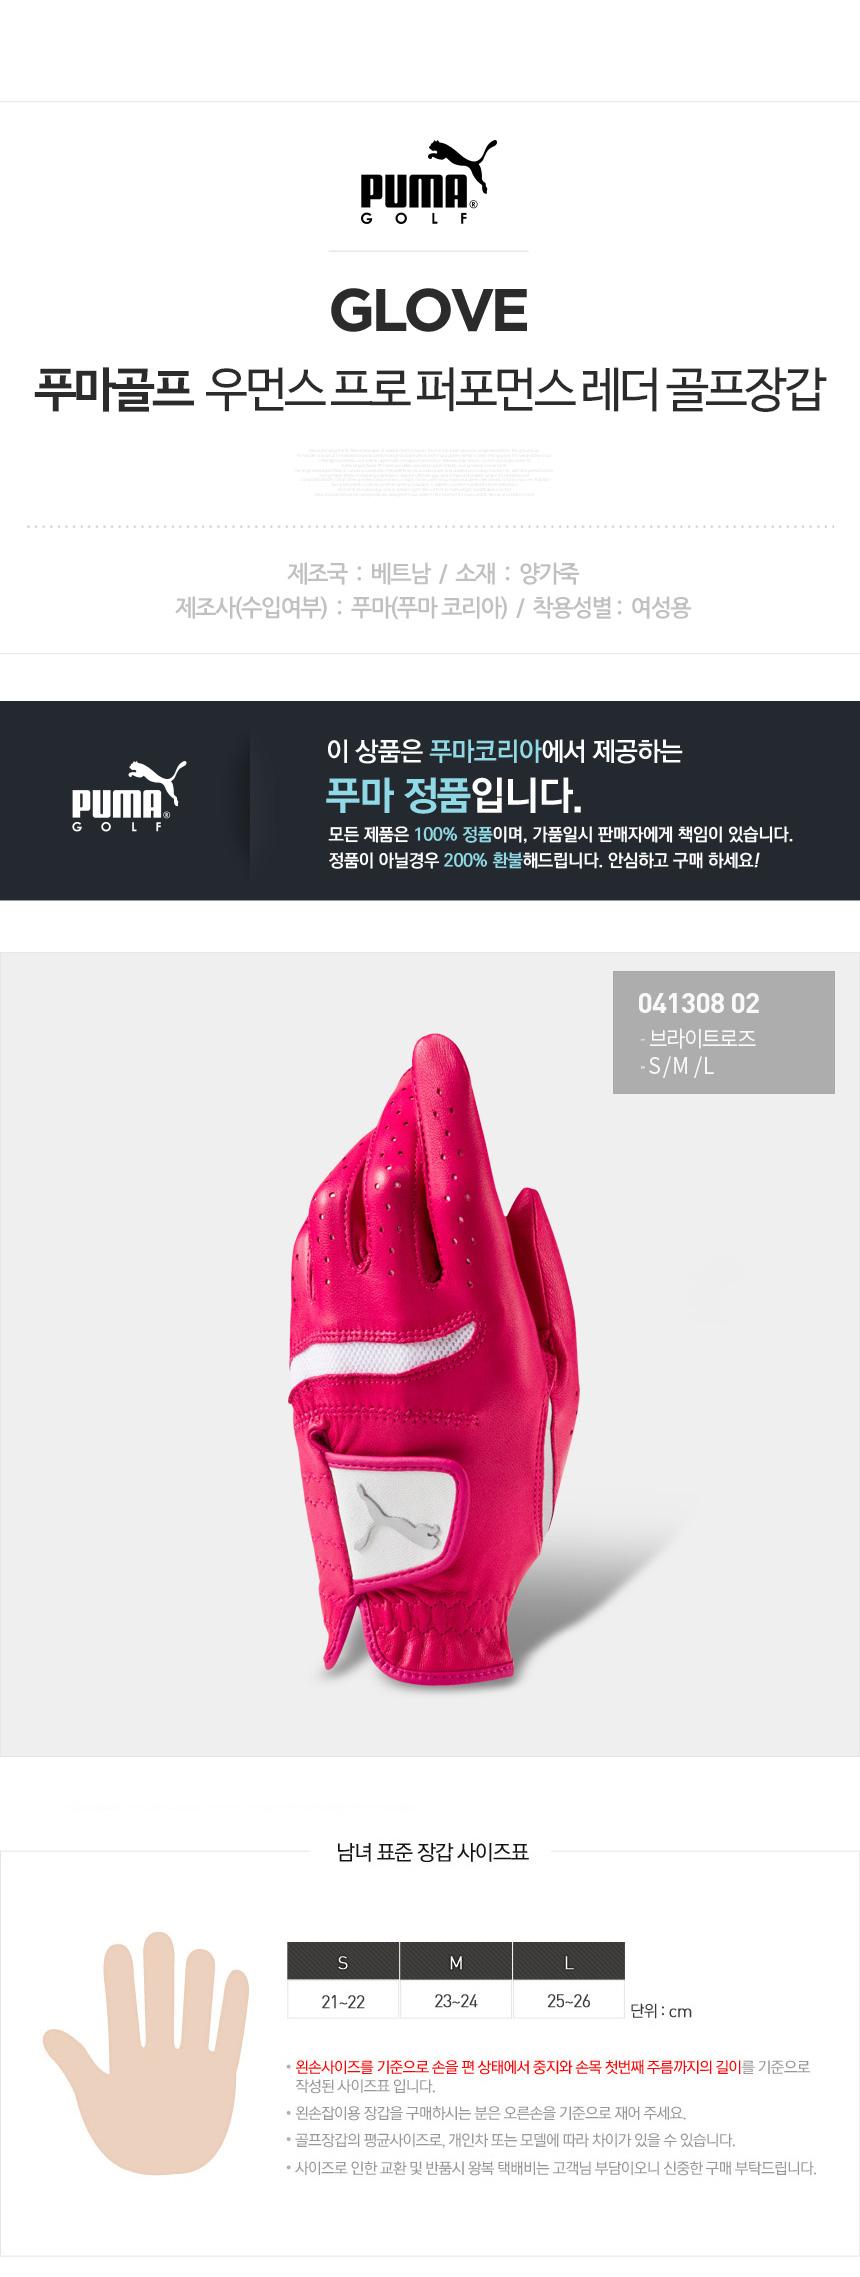 puma_womens_pro_glove_21.jpg